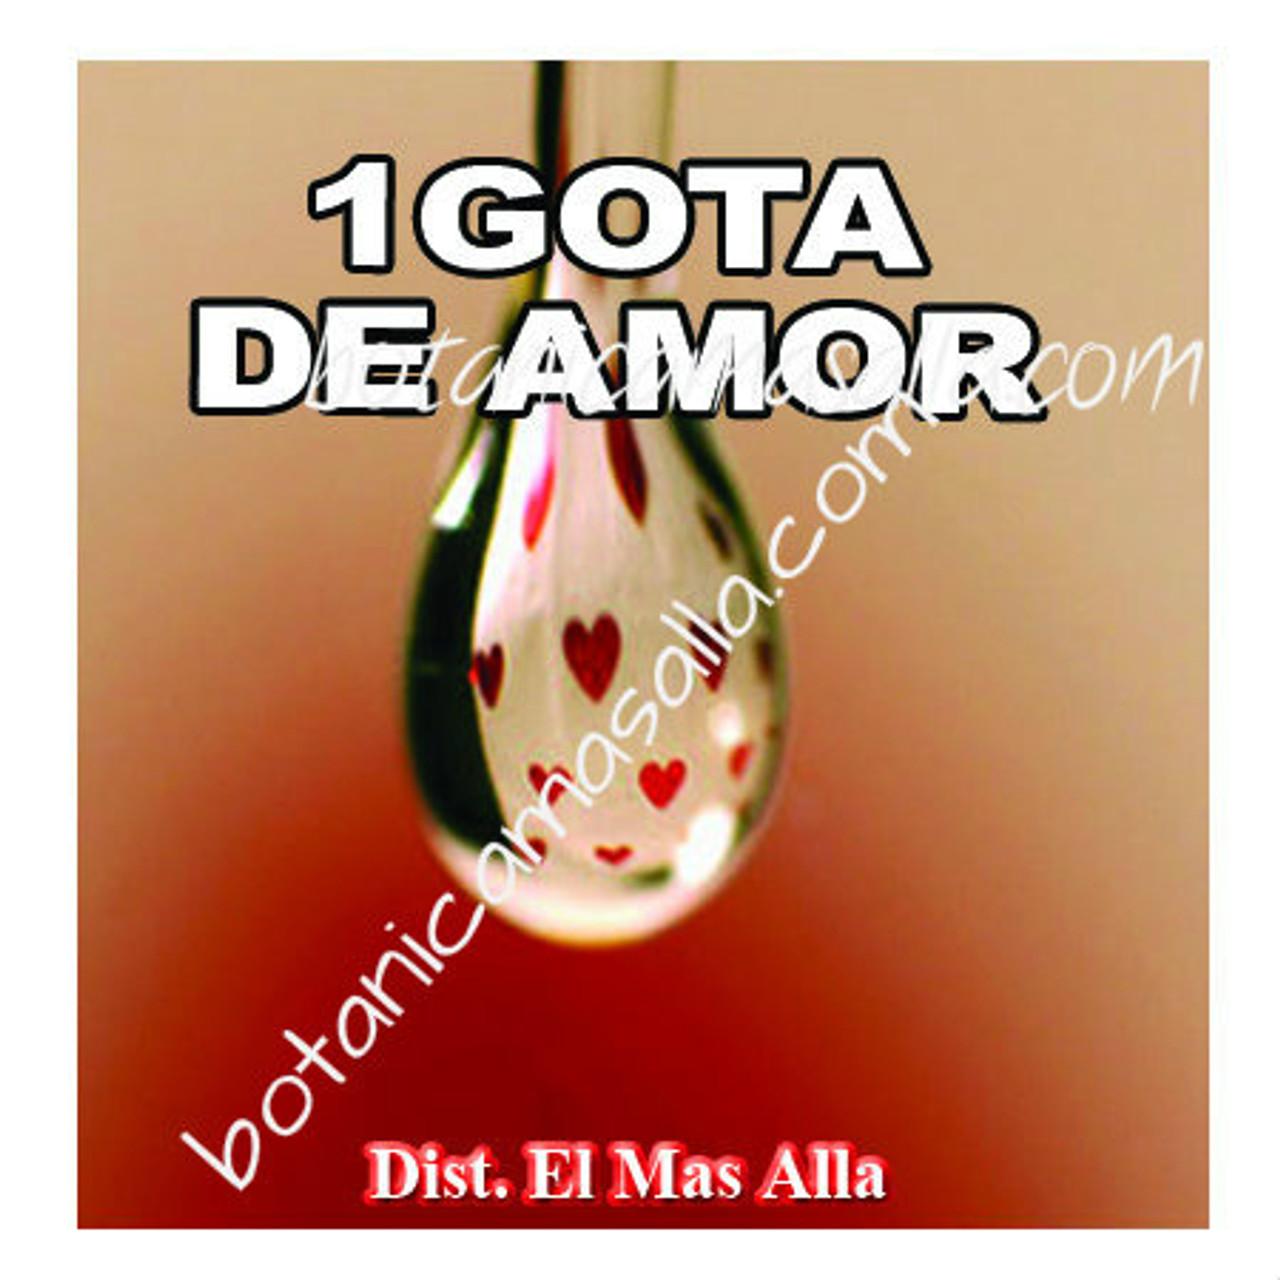 Aceite 1 Gota De Amor - 1 Drop Of Love